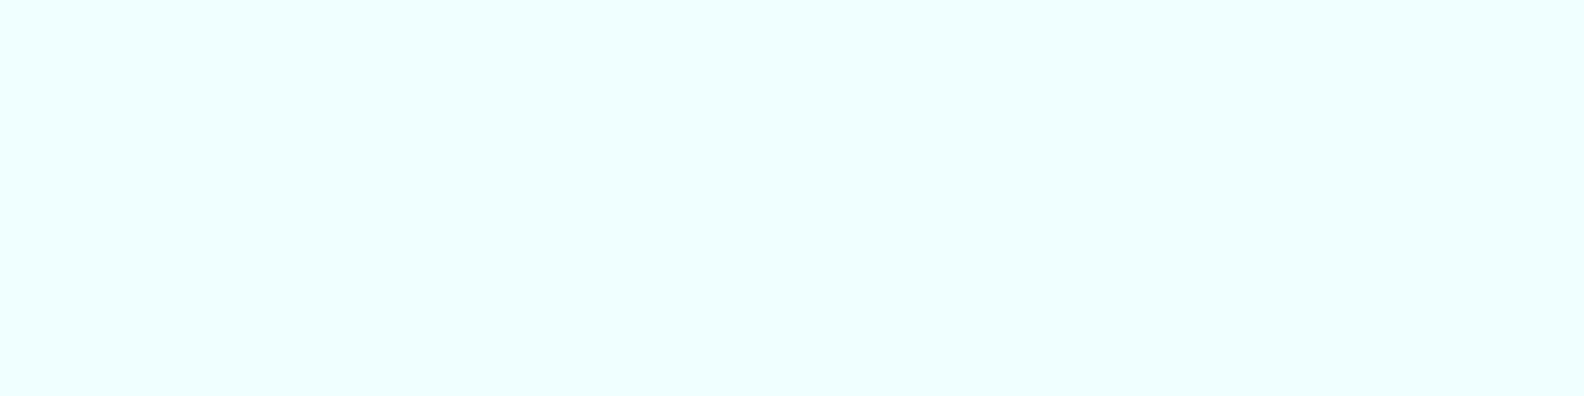 1584x396 Azure Mist Solid Color Background